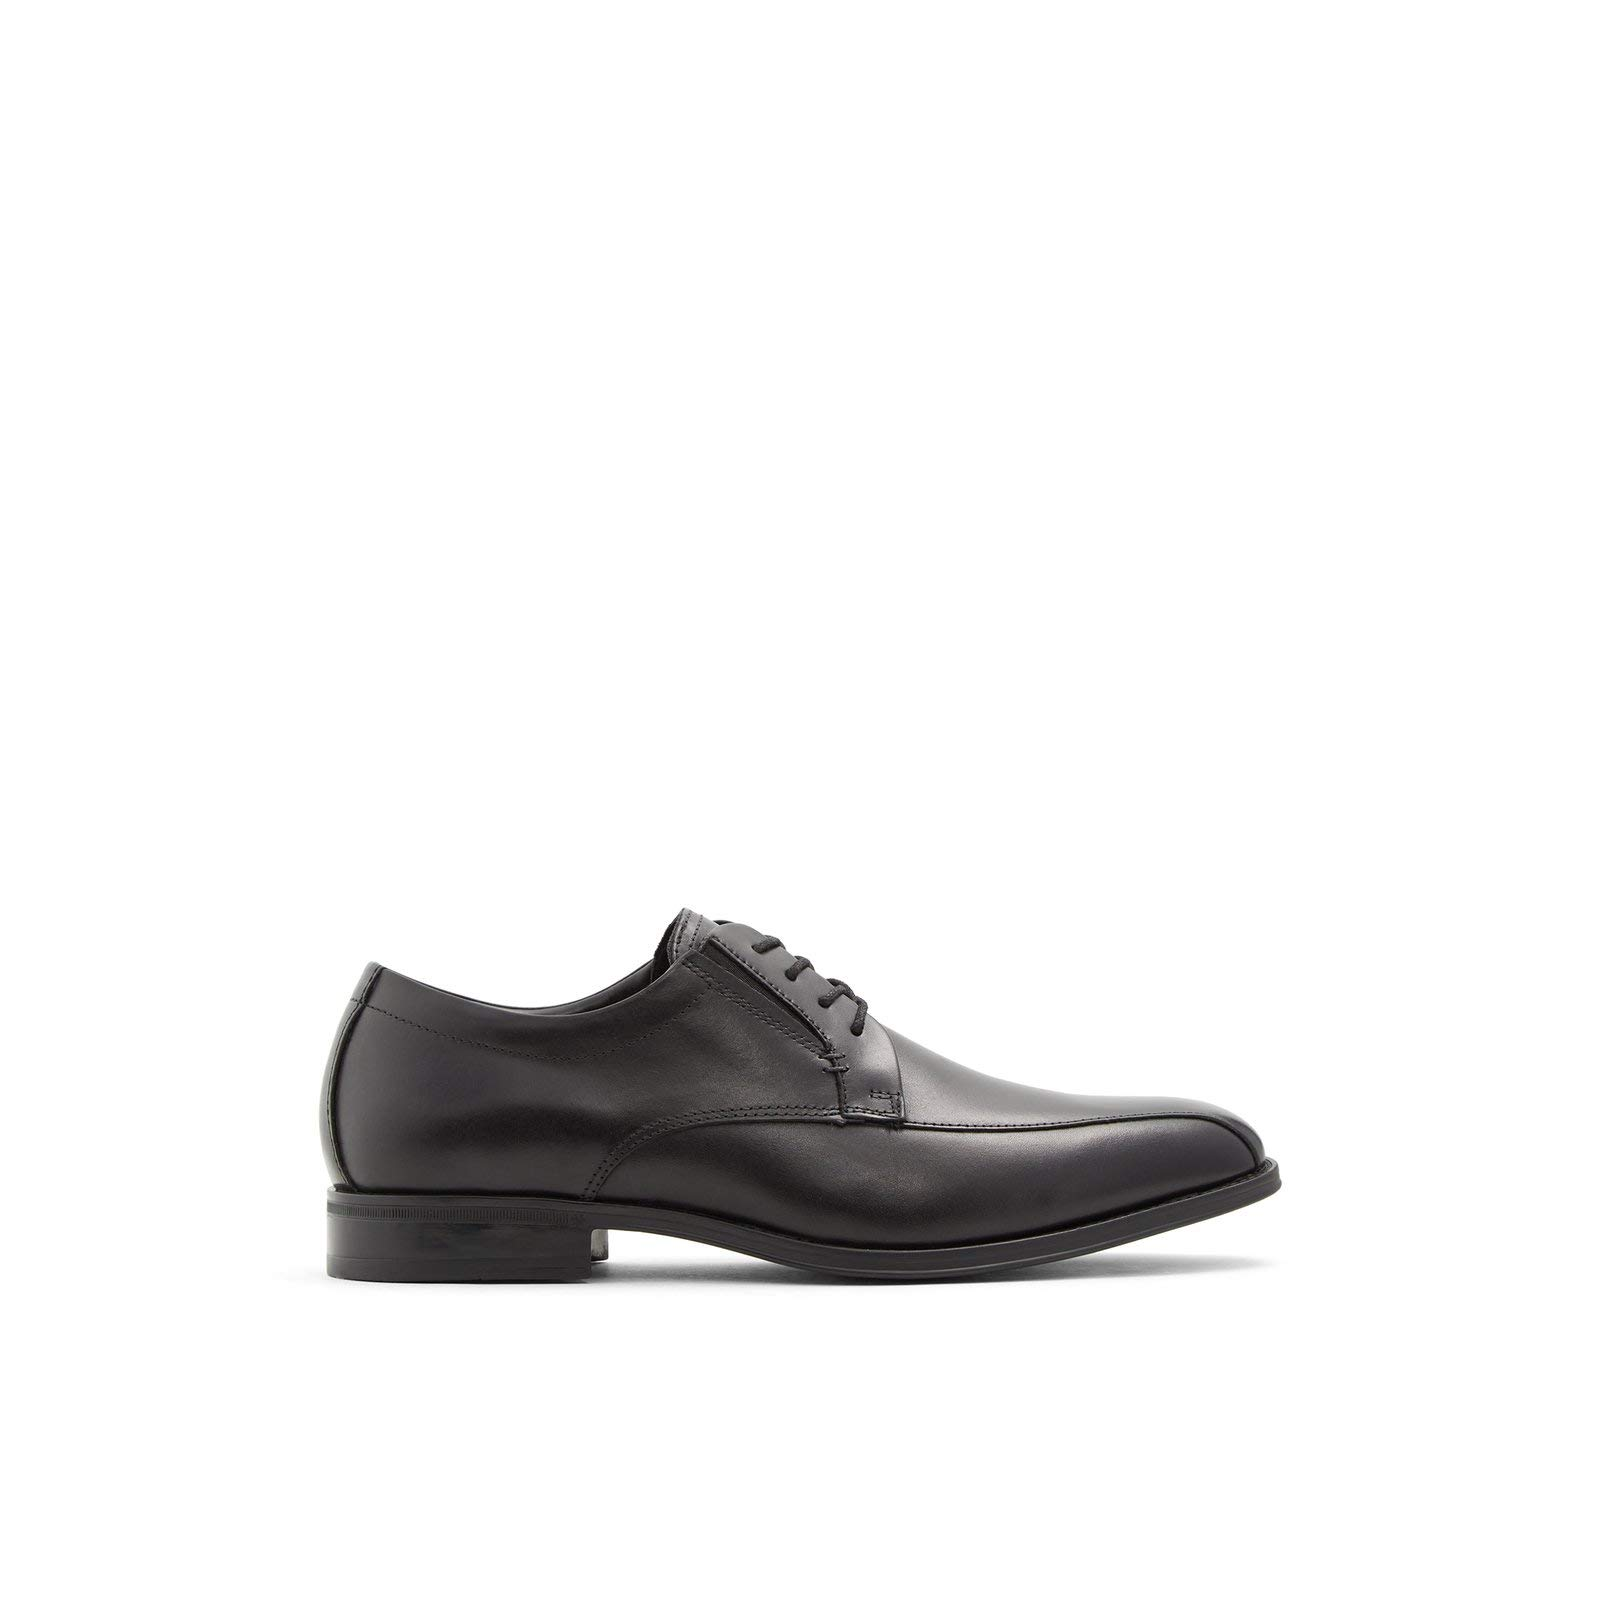 ALDO Men's Spakeman Uniform Dress Shoe, Black, 10 by ALDO